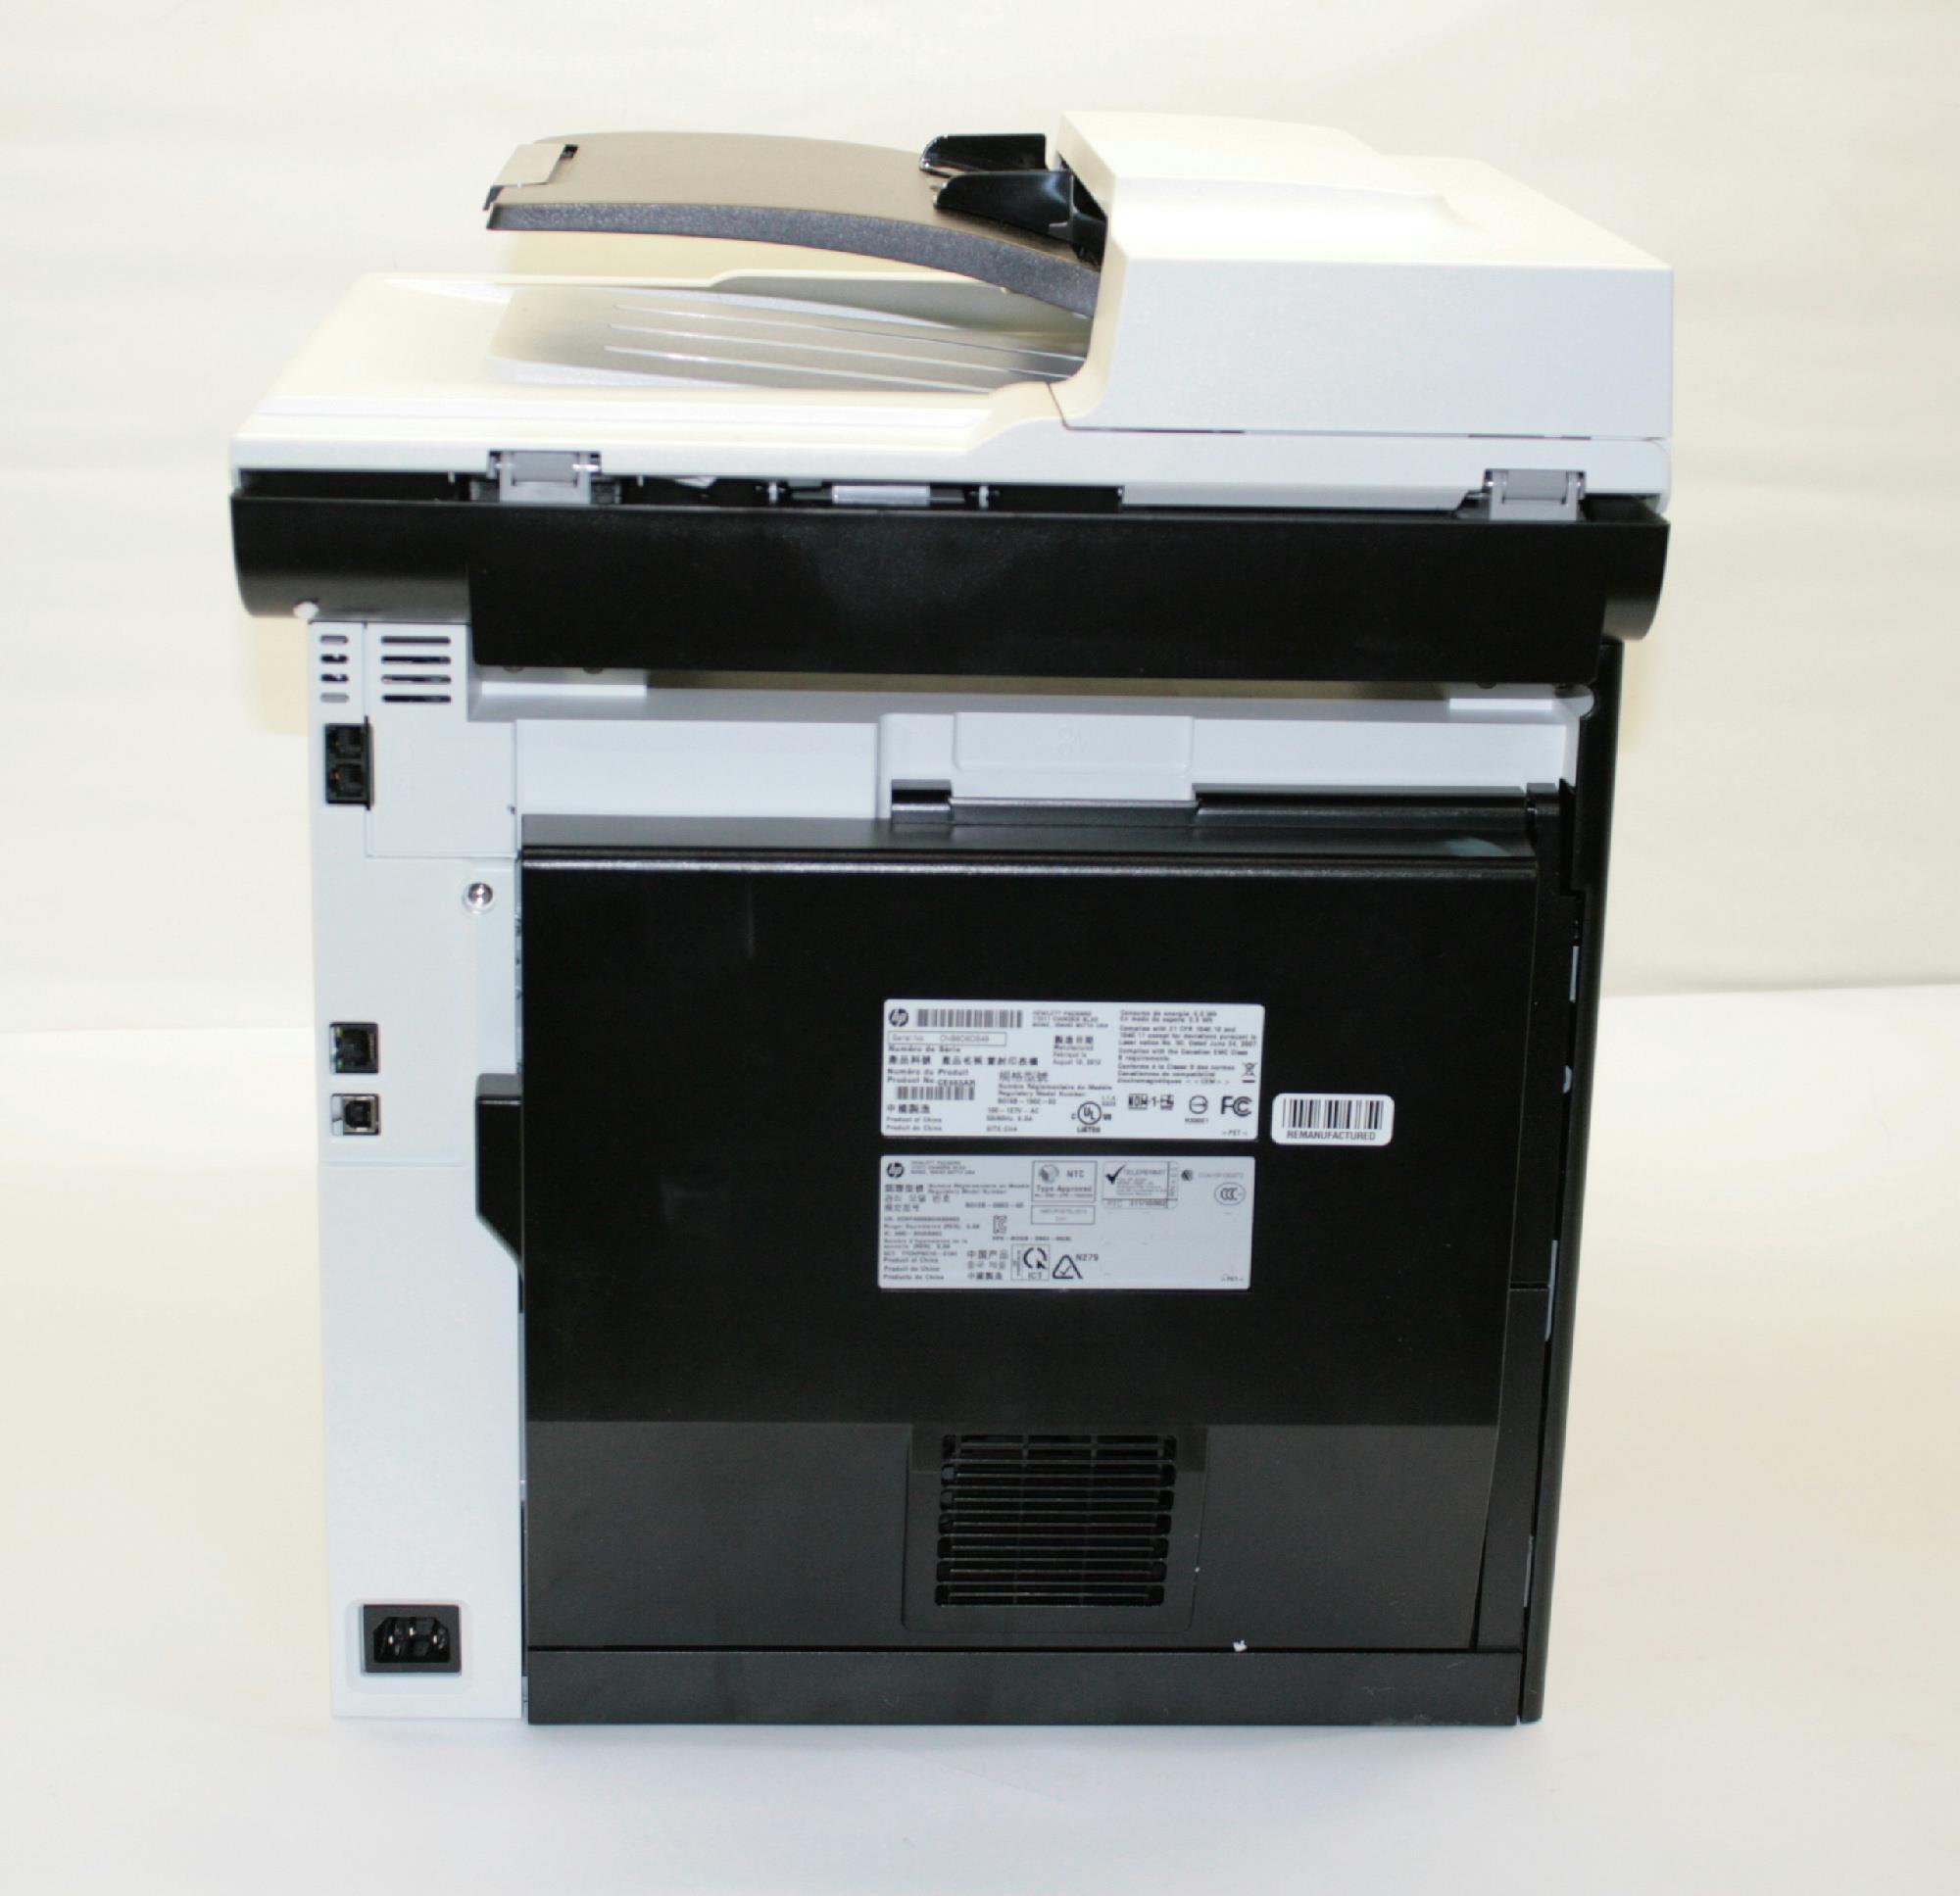 Laserjet Pro 400 Color Mfp M475dn Driver Download